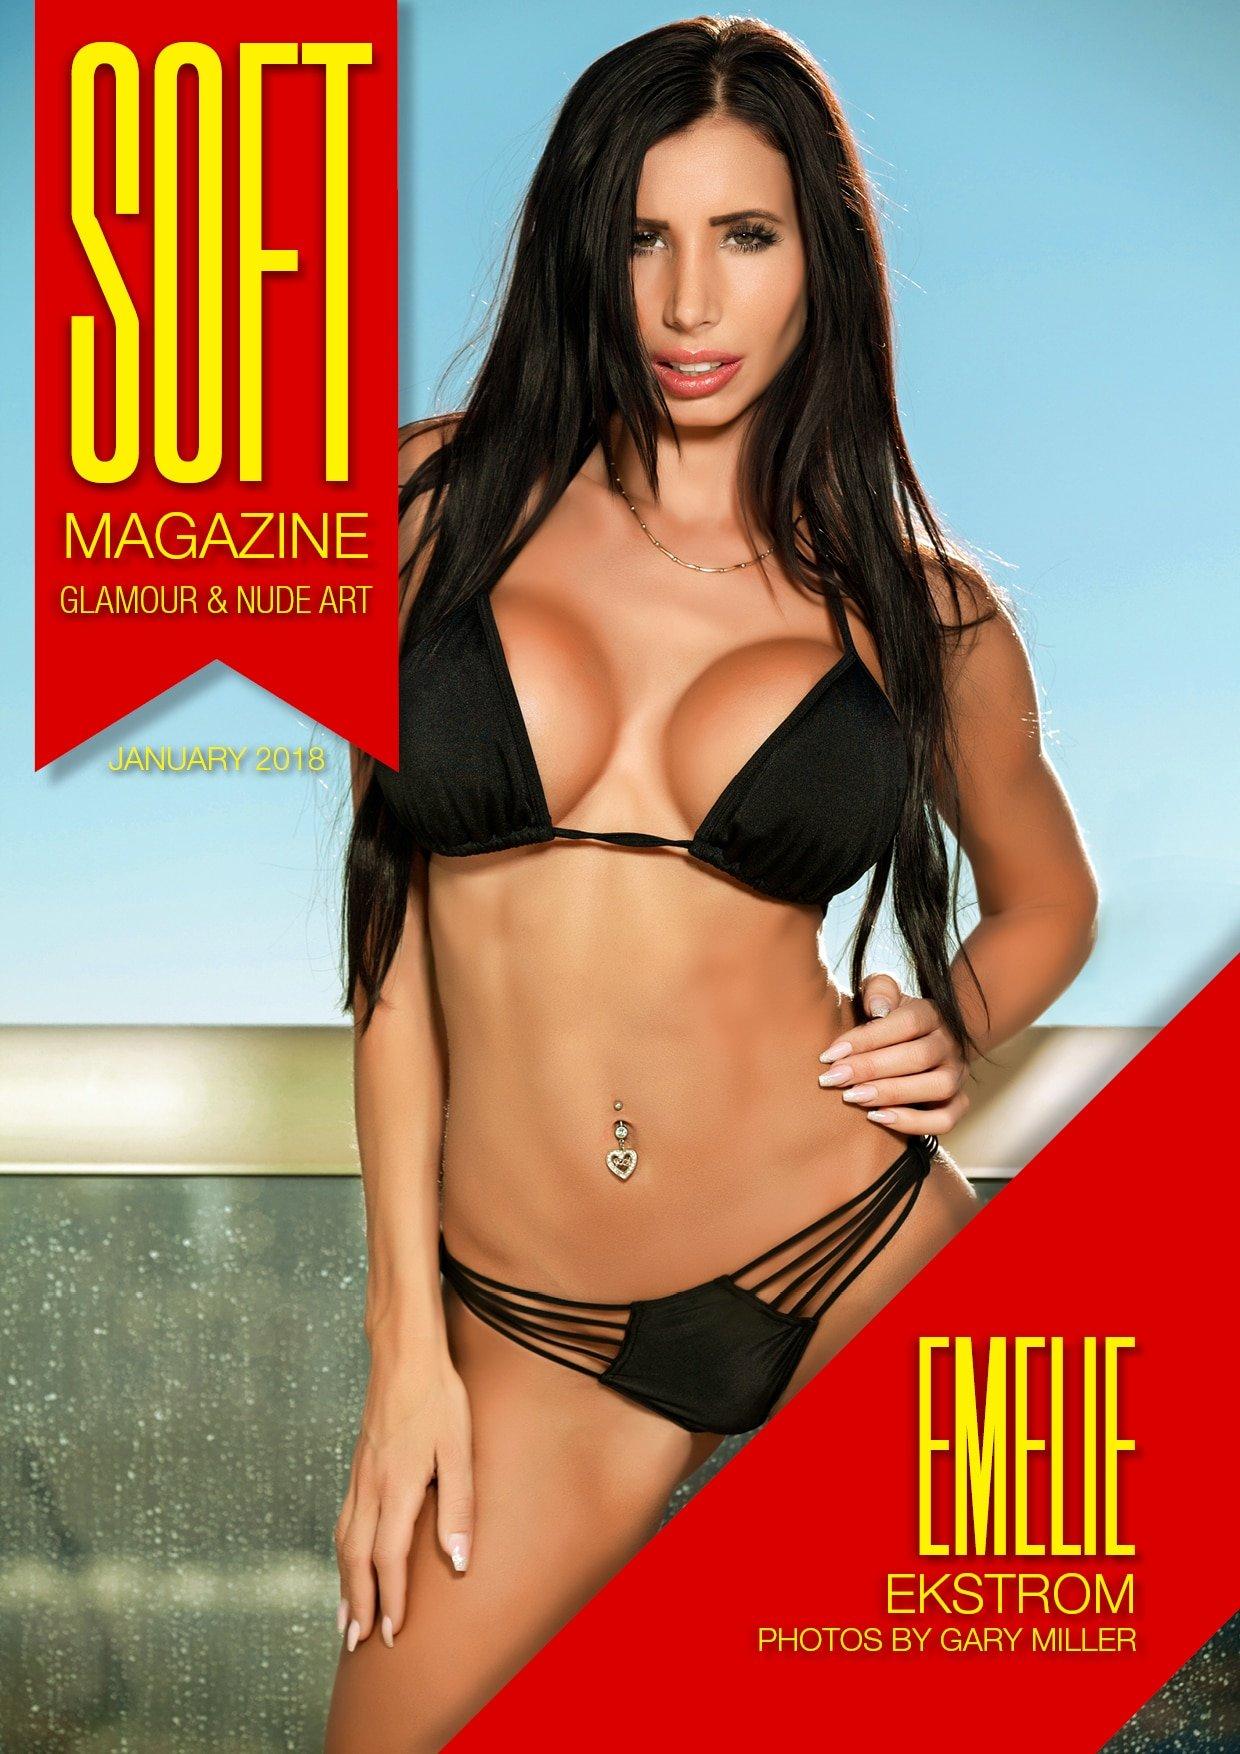 Soft Magazine - January 2018 - Emelie Ekstrom